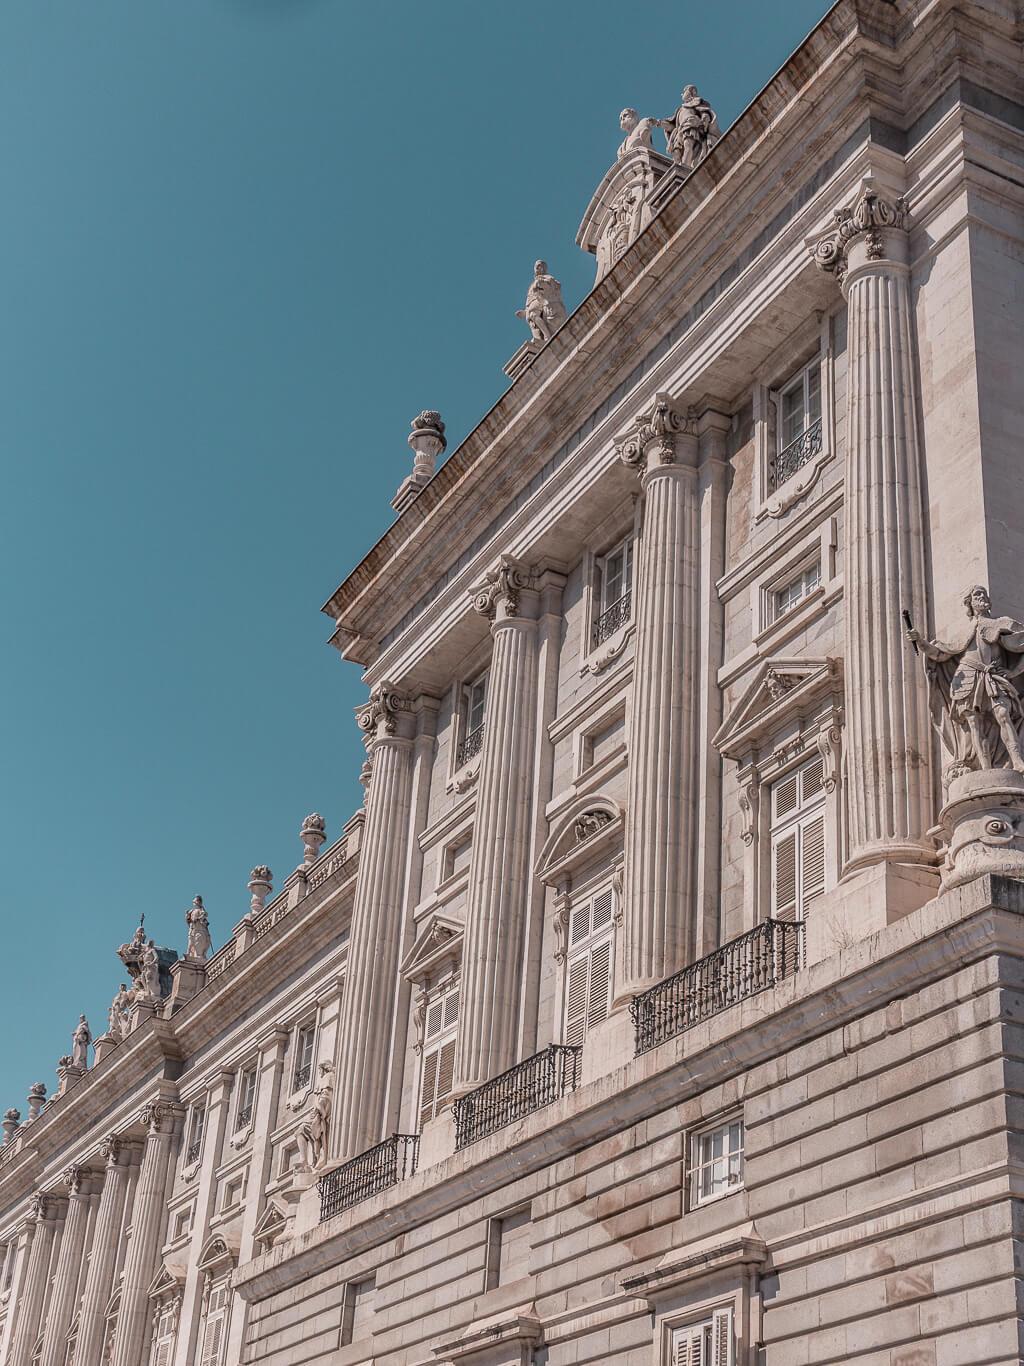 A Guide For Planning A Trip To Madrid - Things to do in the Spanish capital {4 day itinerary, including food & restaurants tips, shopping and sightseeing}   מדריך טיול למדריד - מה יש לעשות במדריד   שופינג במדריד